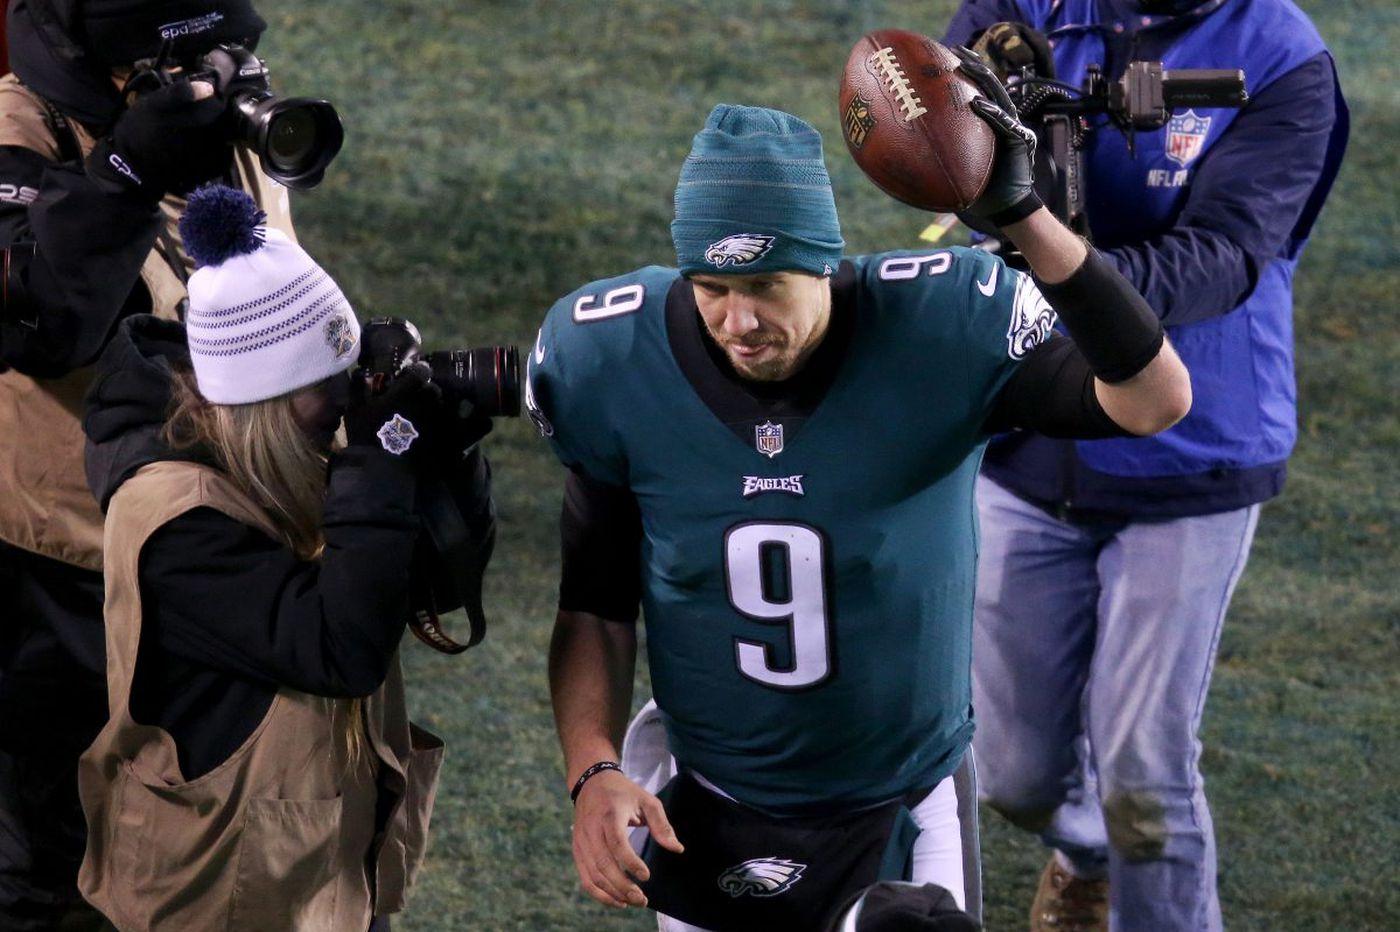 Eagles' Nick Foles somehow won the quarterback matchup